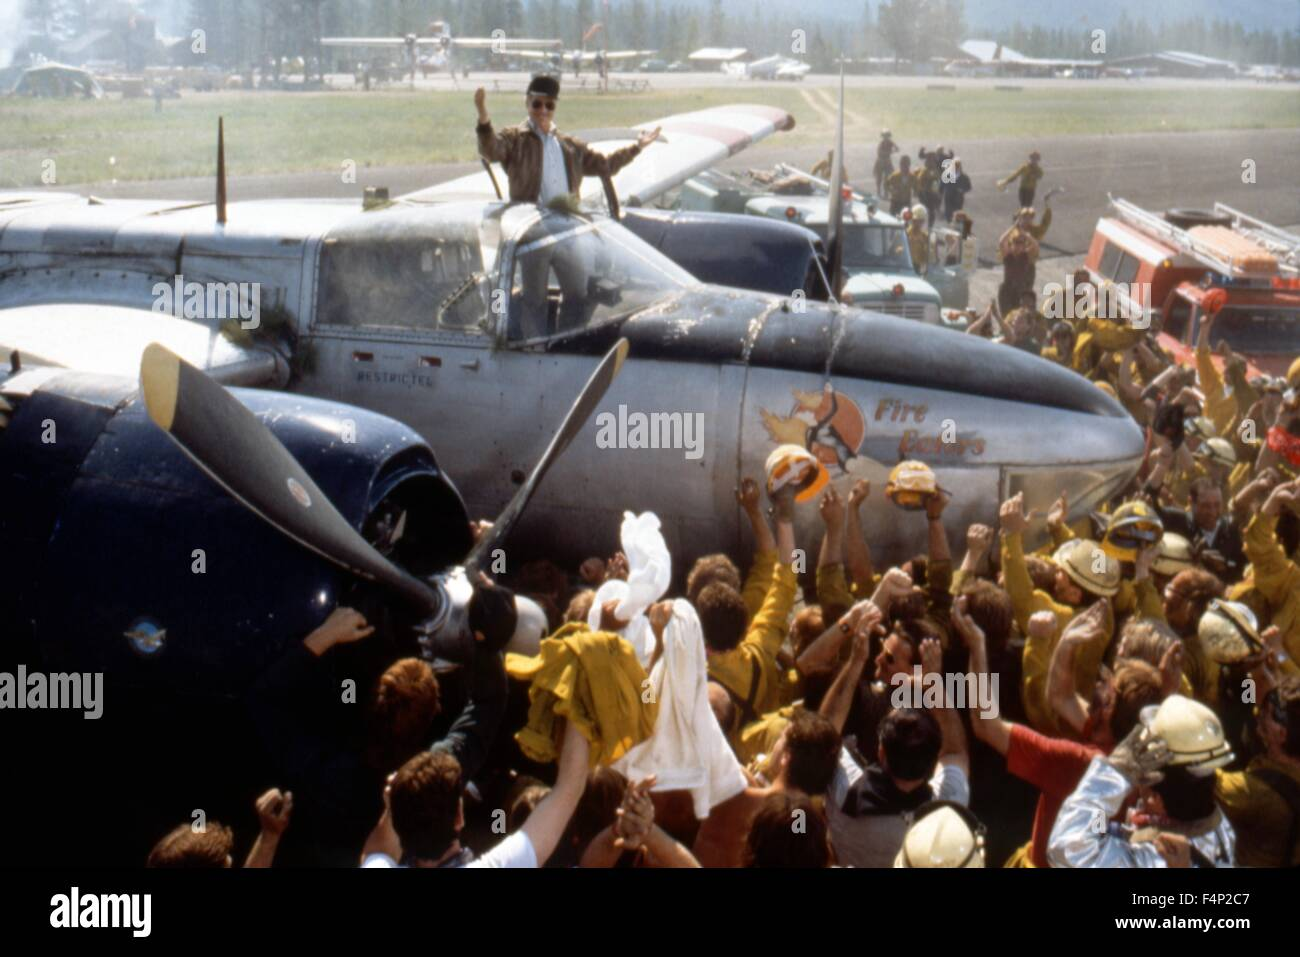 Richard Dreyfuss / siempre de 1989 dirigida por Steven Spielberg Imagen De Stock